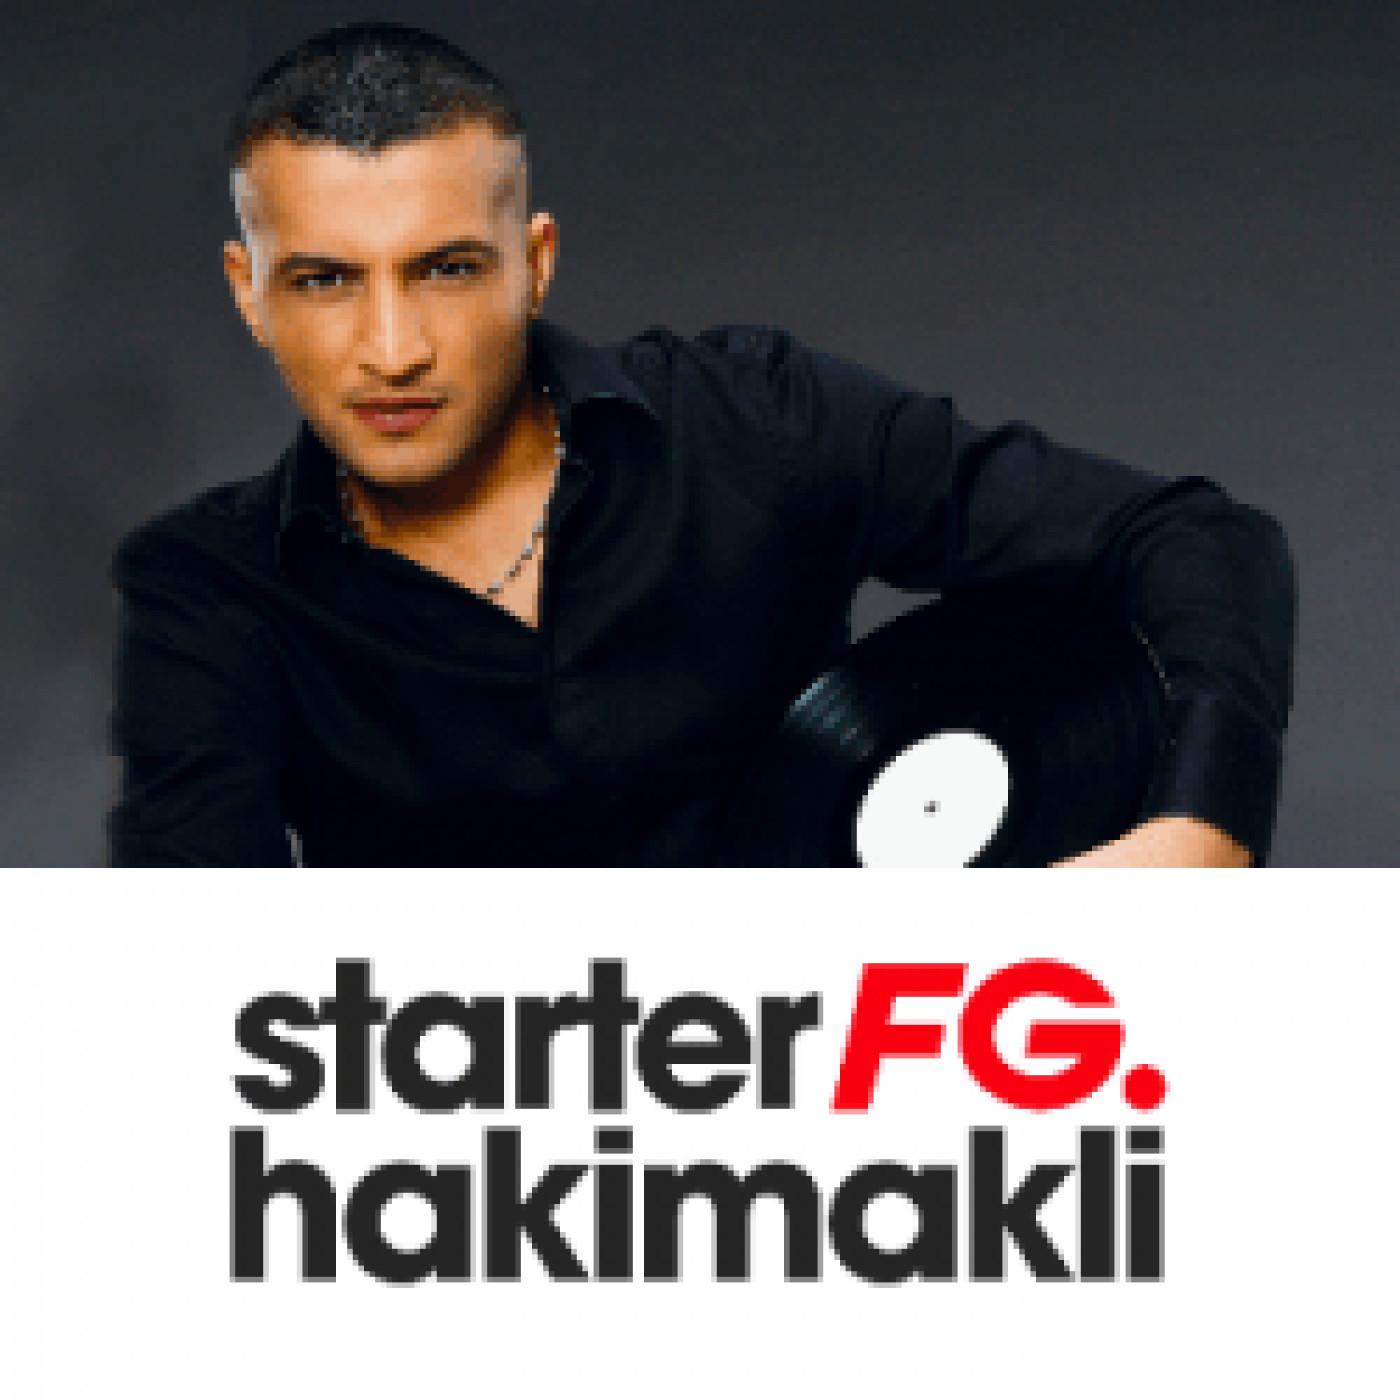 STARTER FG BY HAKIMAKLI MARDI 24 NOVEMBRE 2020